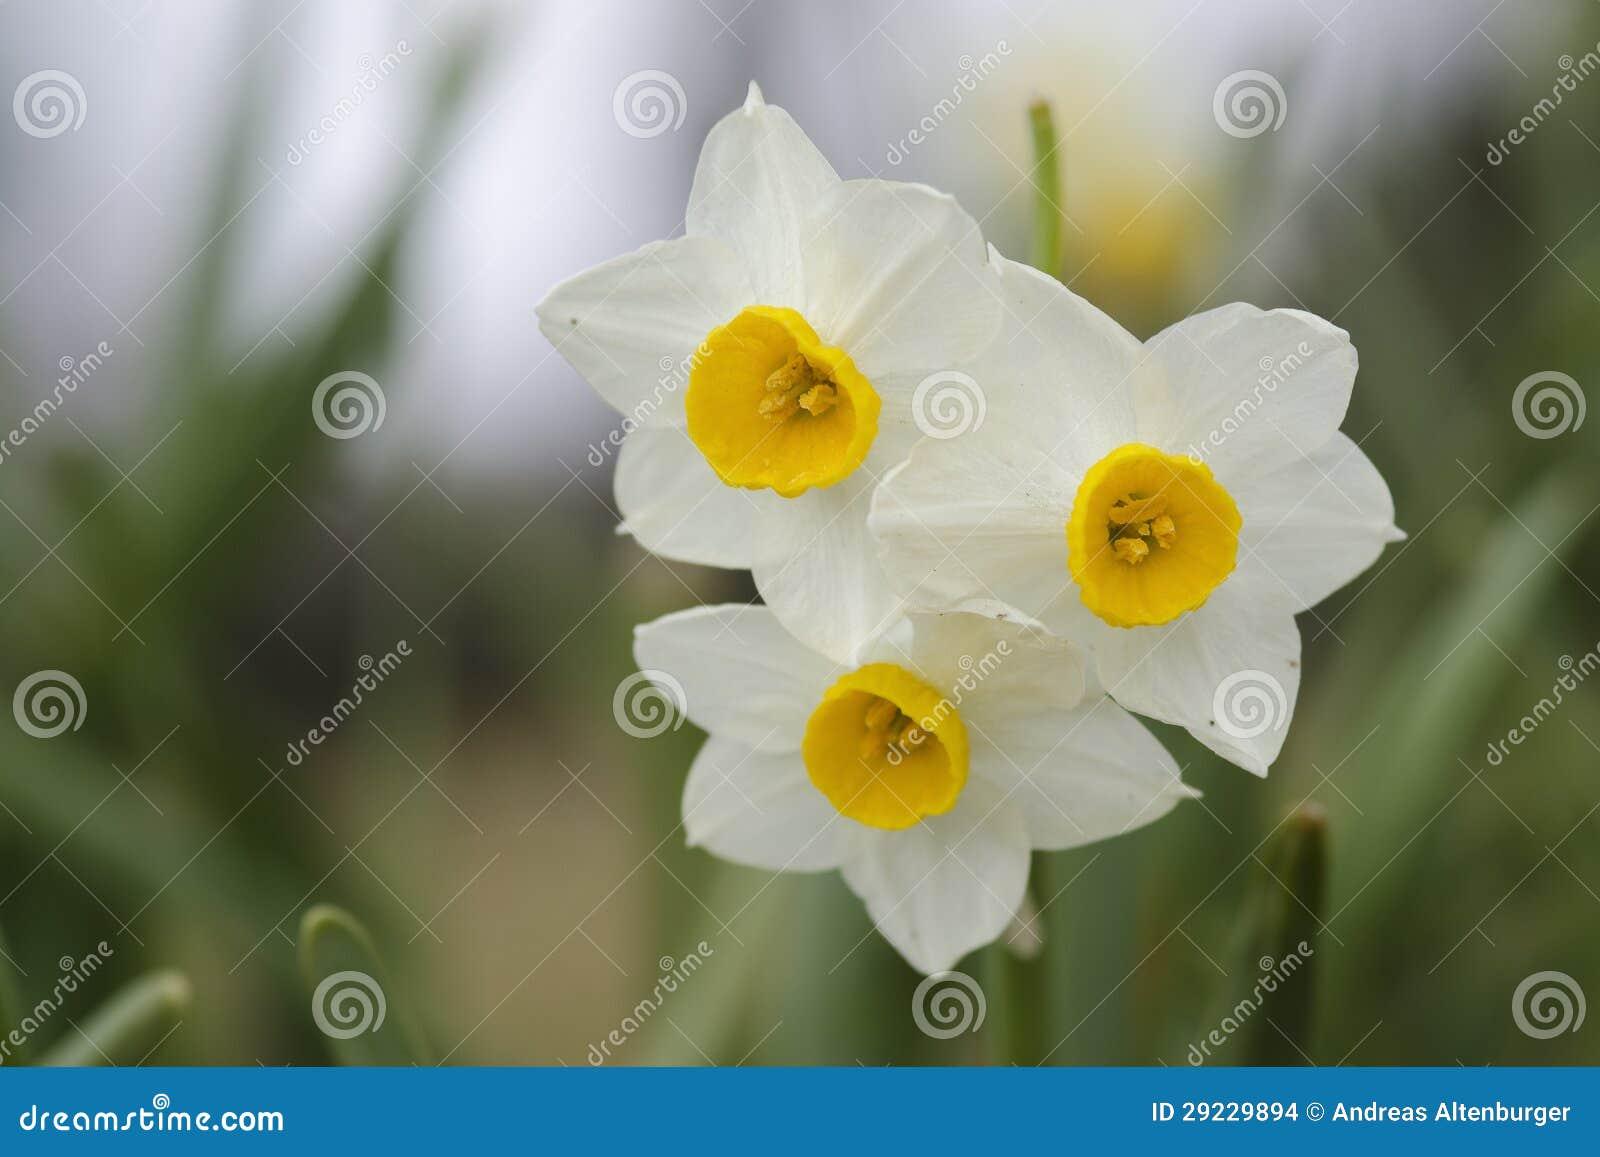 Download Flores do Daffodil foto de stock. Imagem de flor, nasals - 29229894